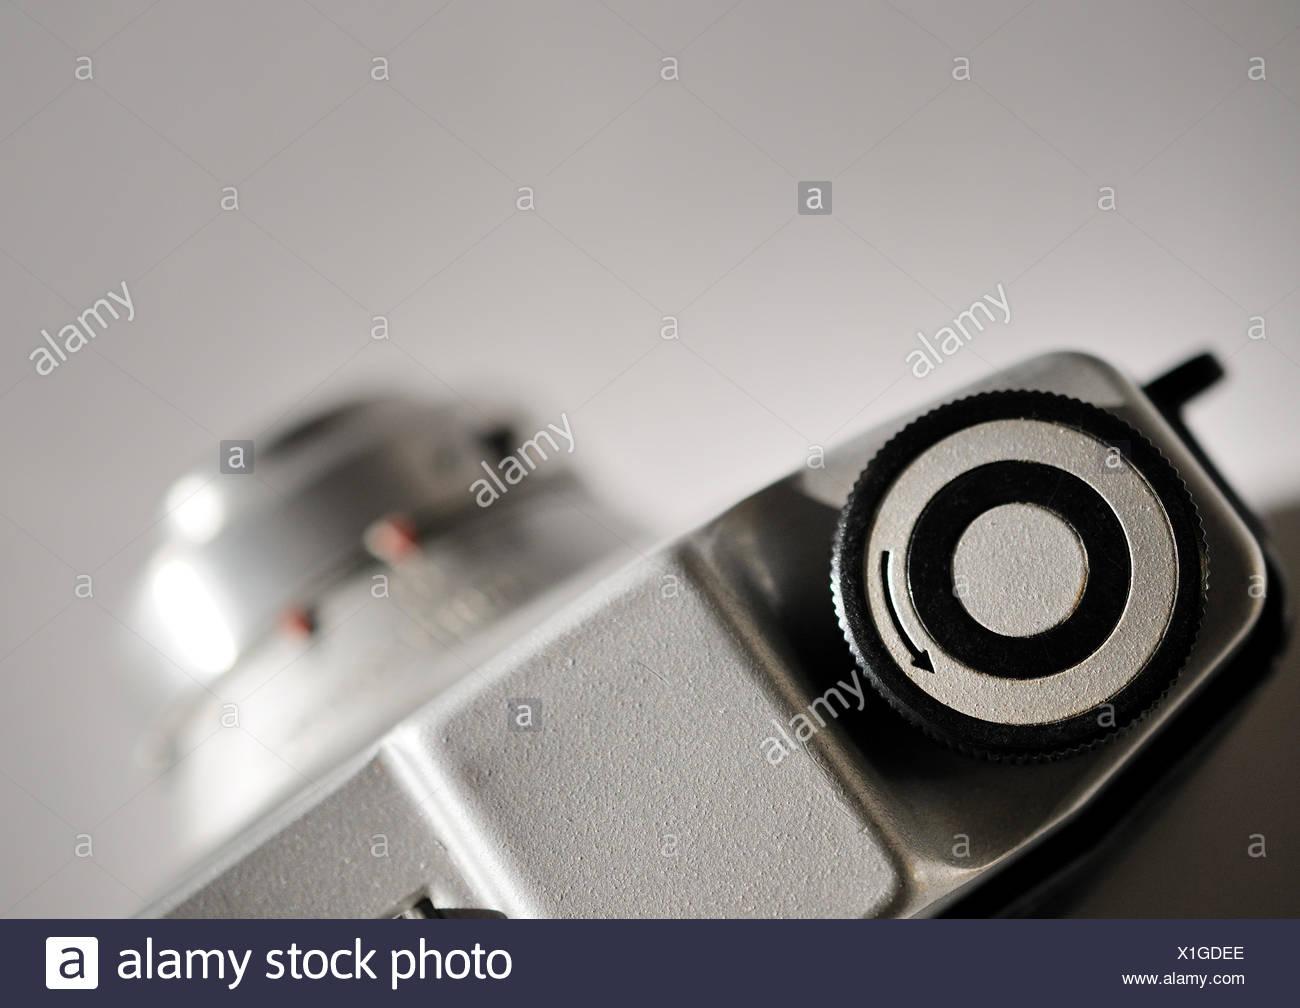 camera,analog,rangefinder camera - Stock Image